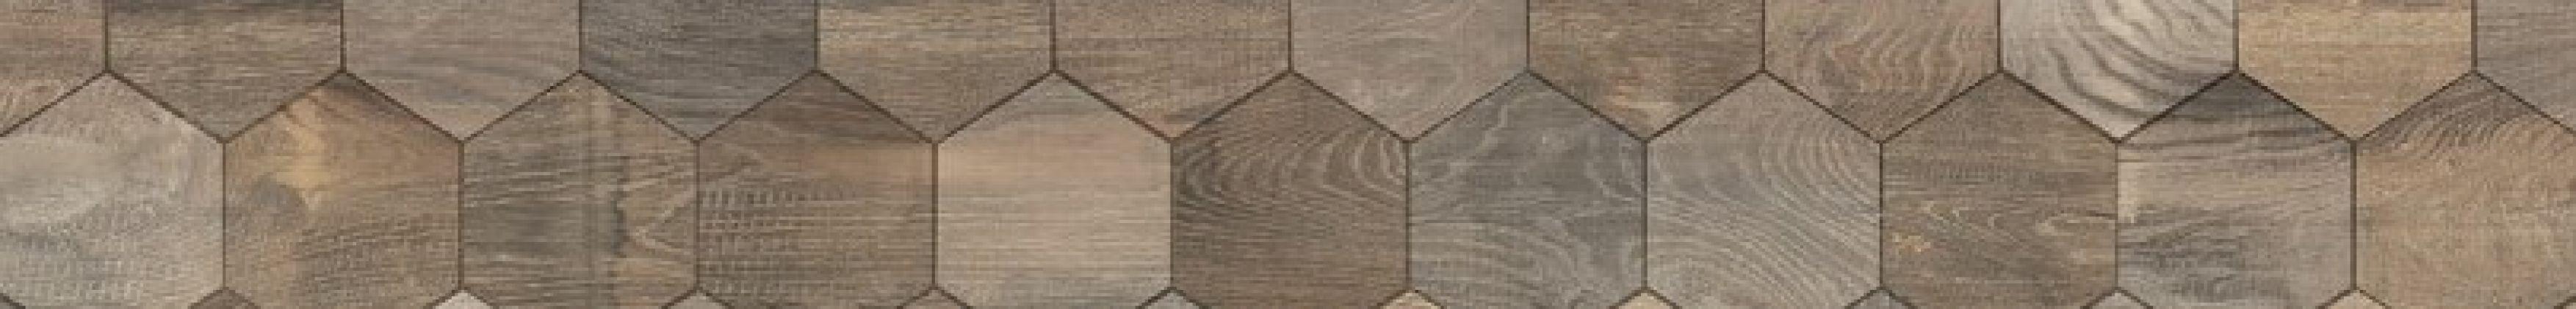 TUDOR Intarsio Marron 15x90